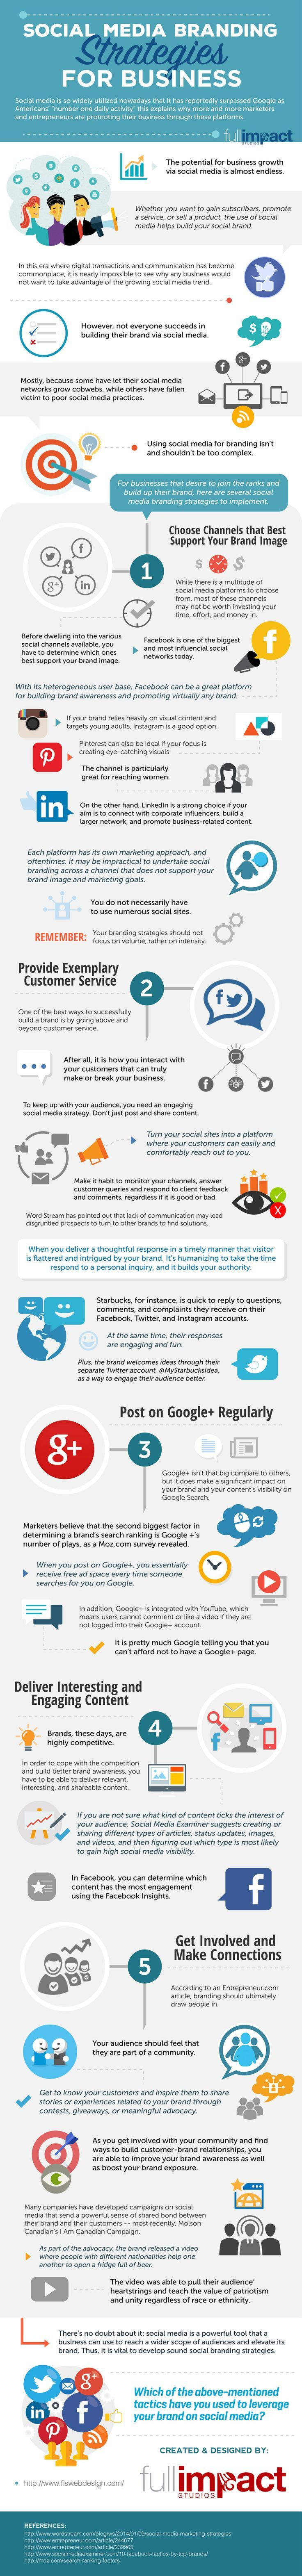 5 Social Media Branding Strategies for Business [Infographic]   Social Media Today